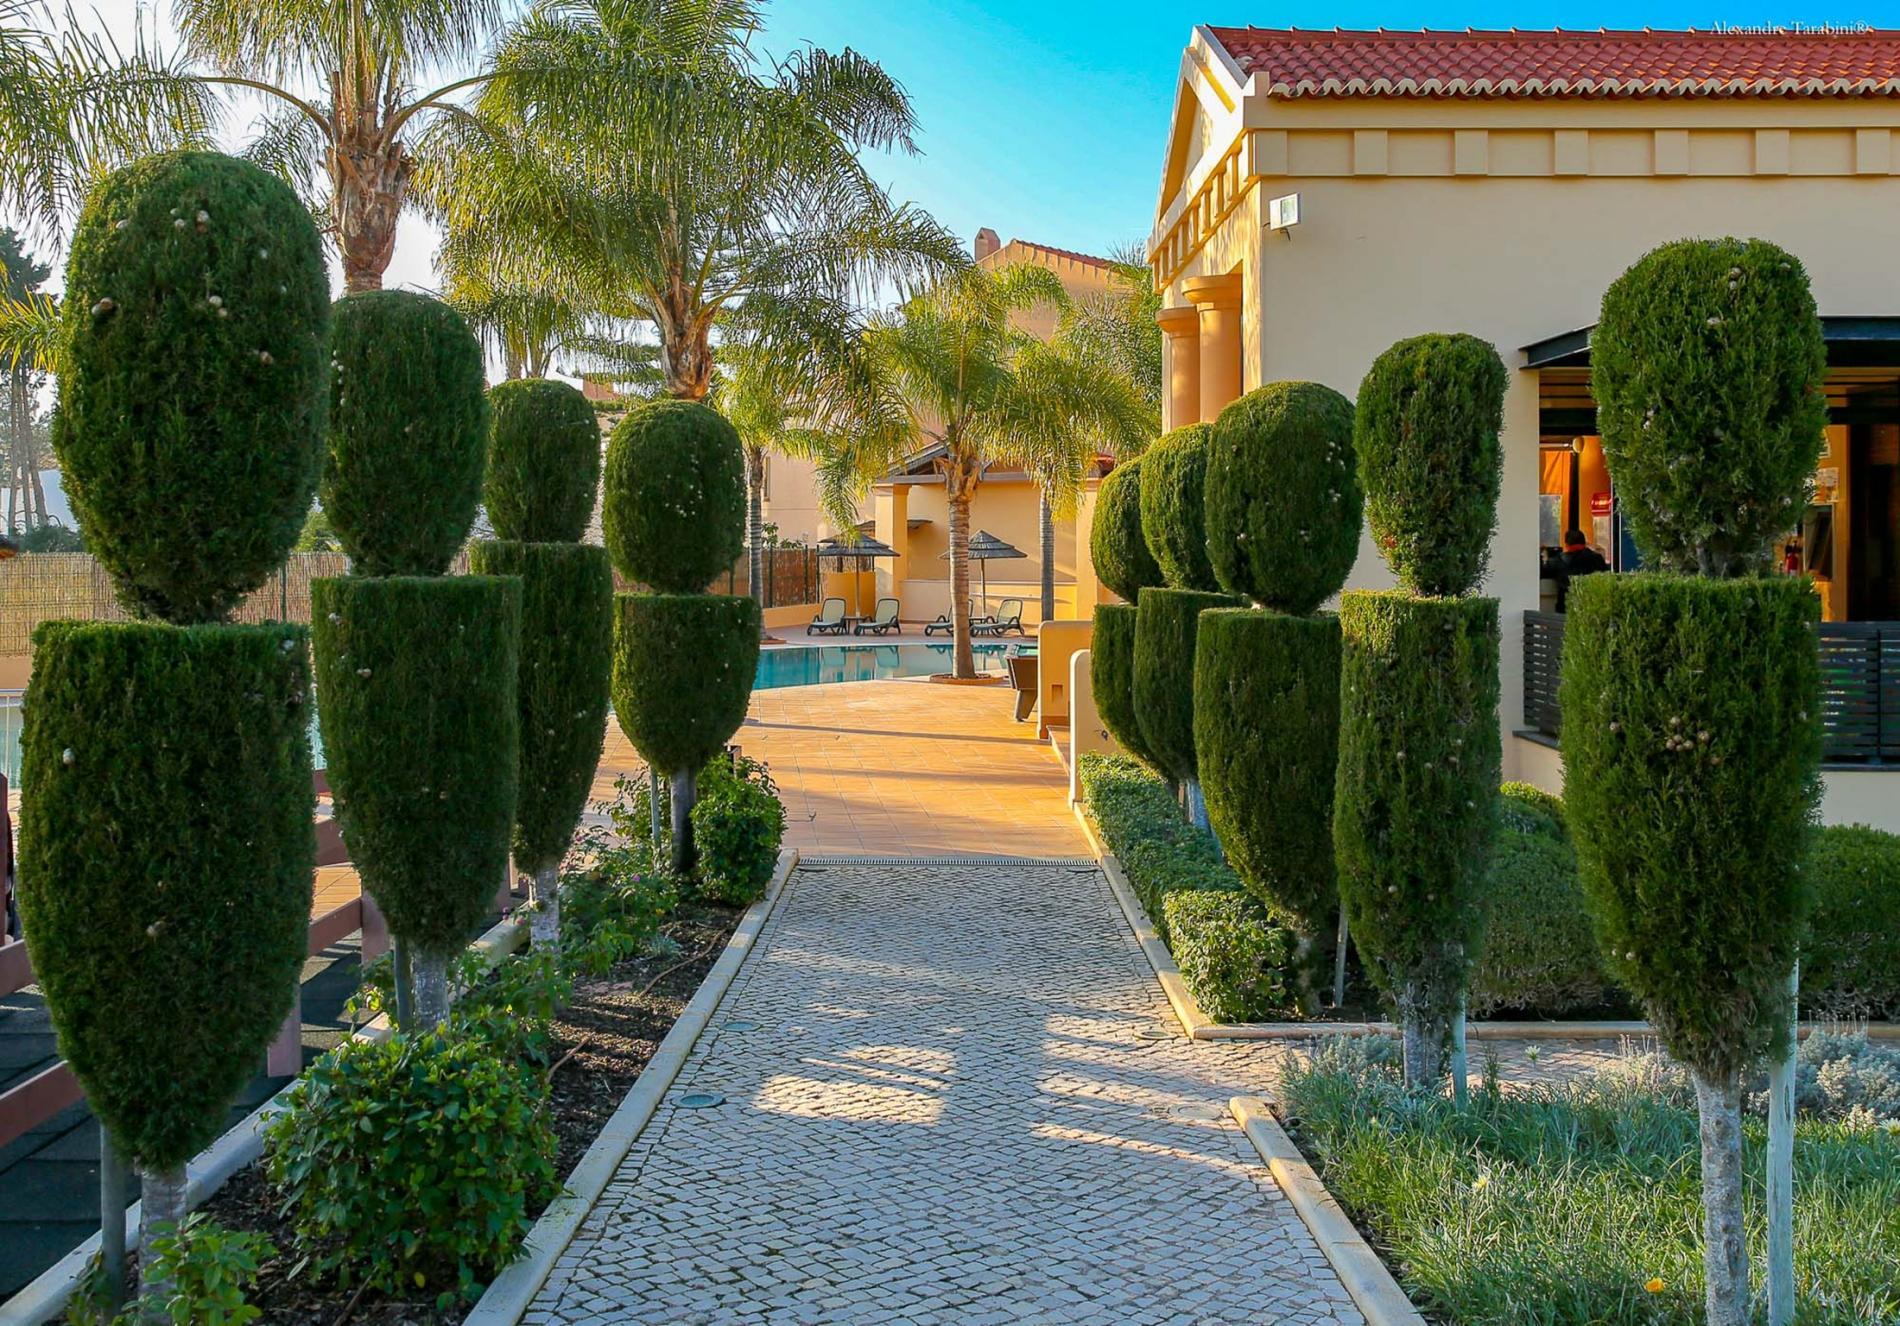 Ferienwohnung A24 - LuzBay Beach Apartment (2558091), Luz, , Algarve, Portugal, Bild 34